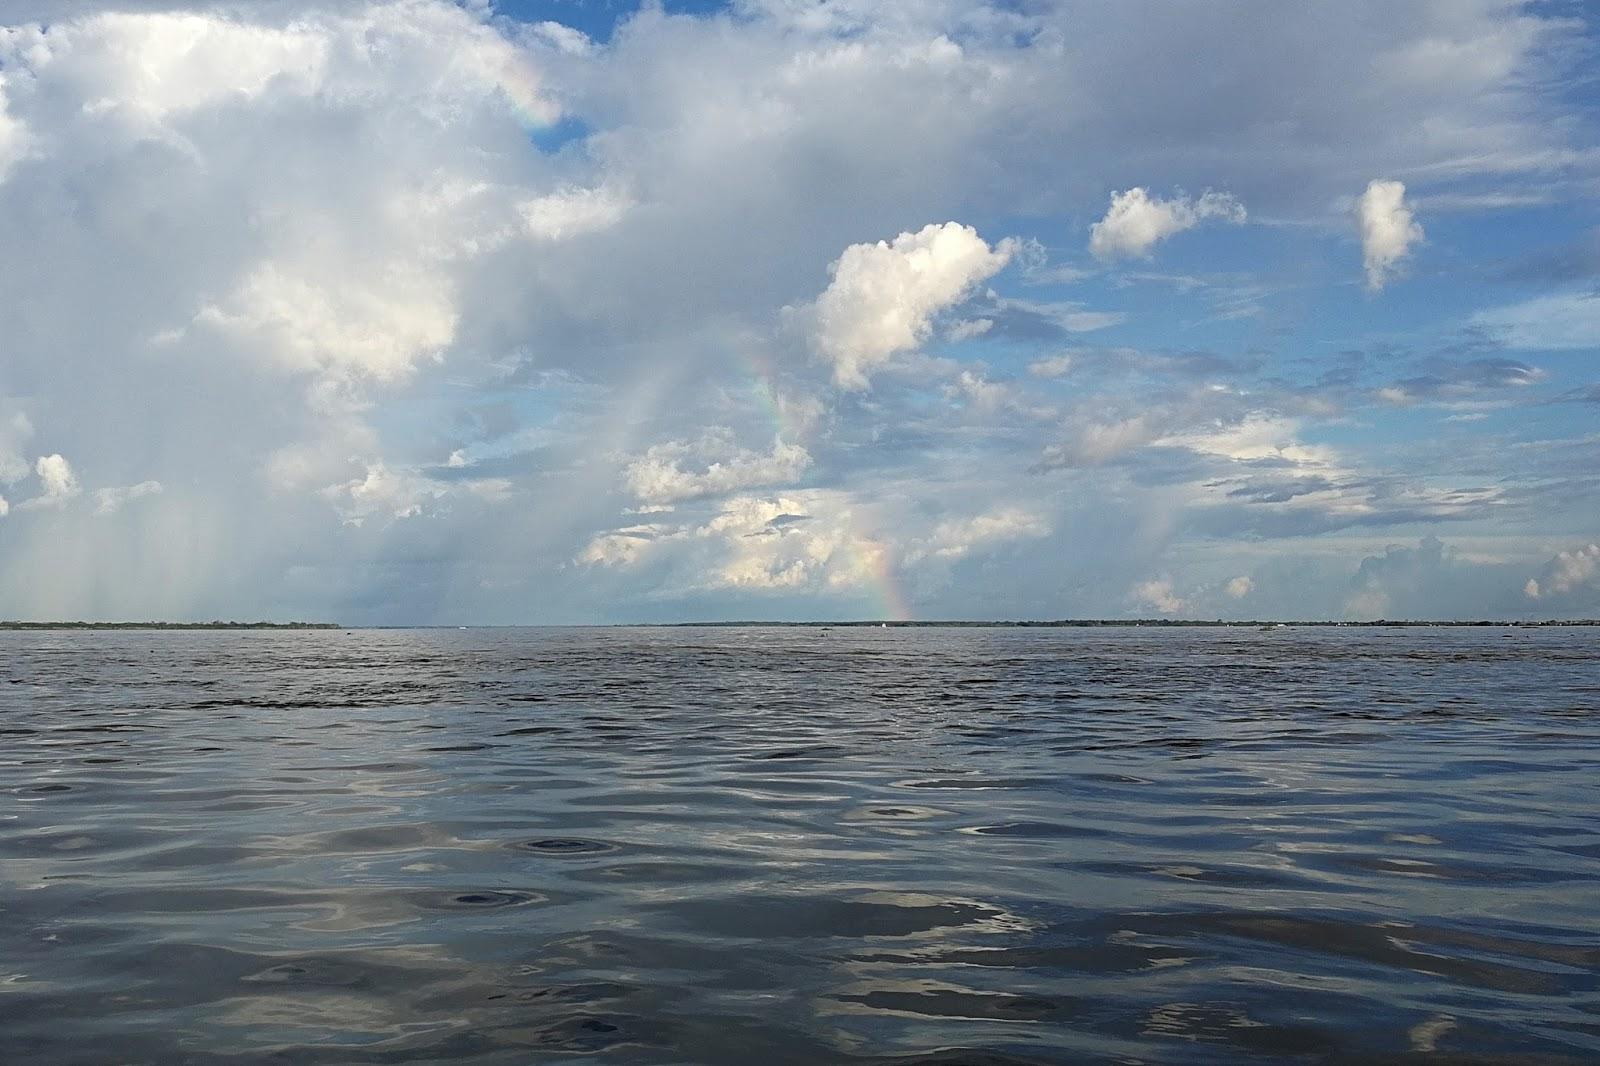 Río Amazonas, Turismo Interno, Perú